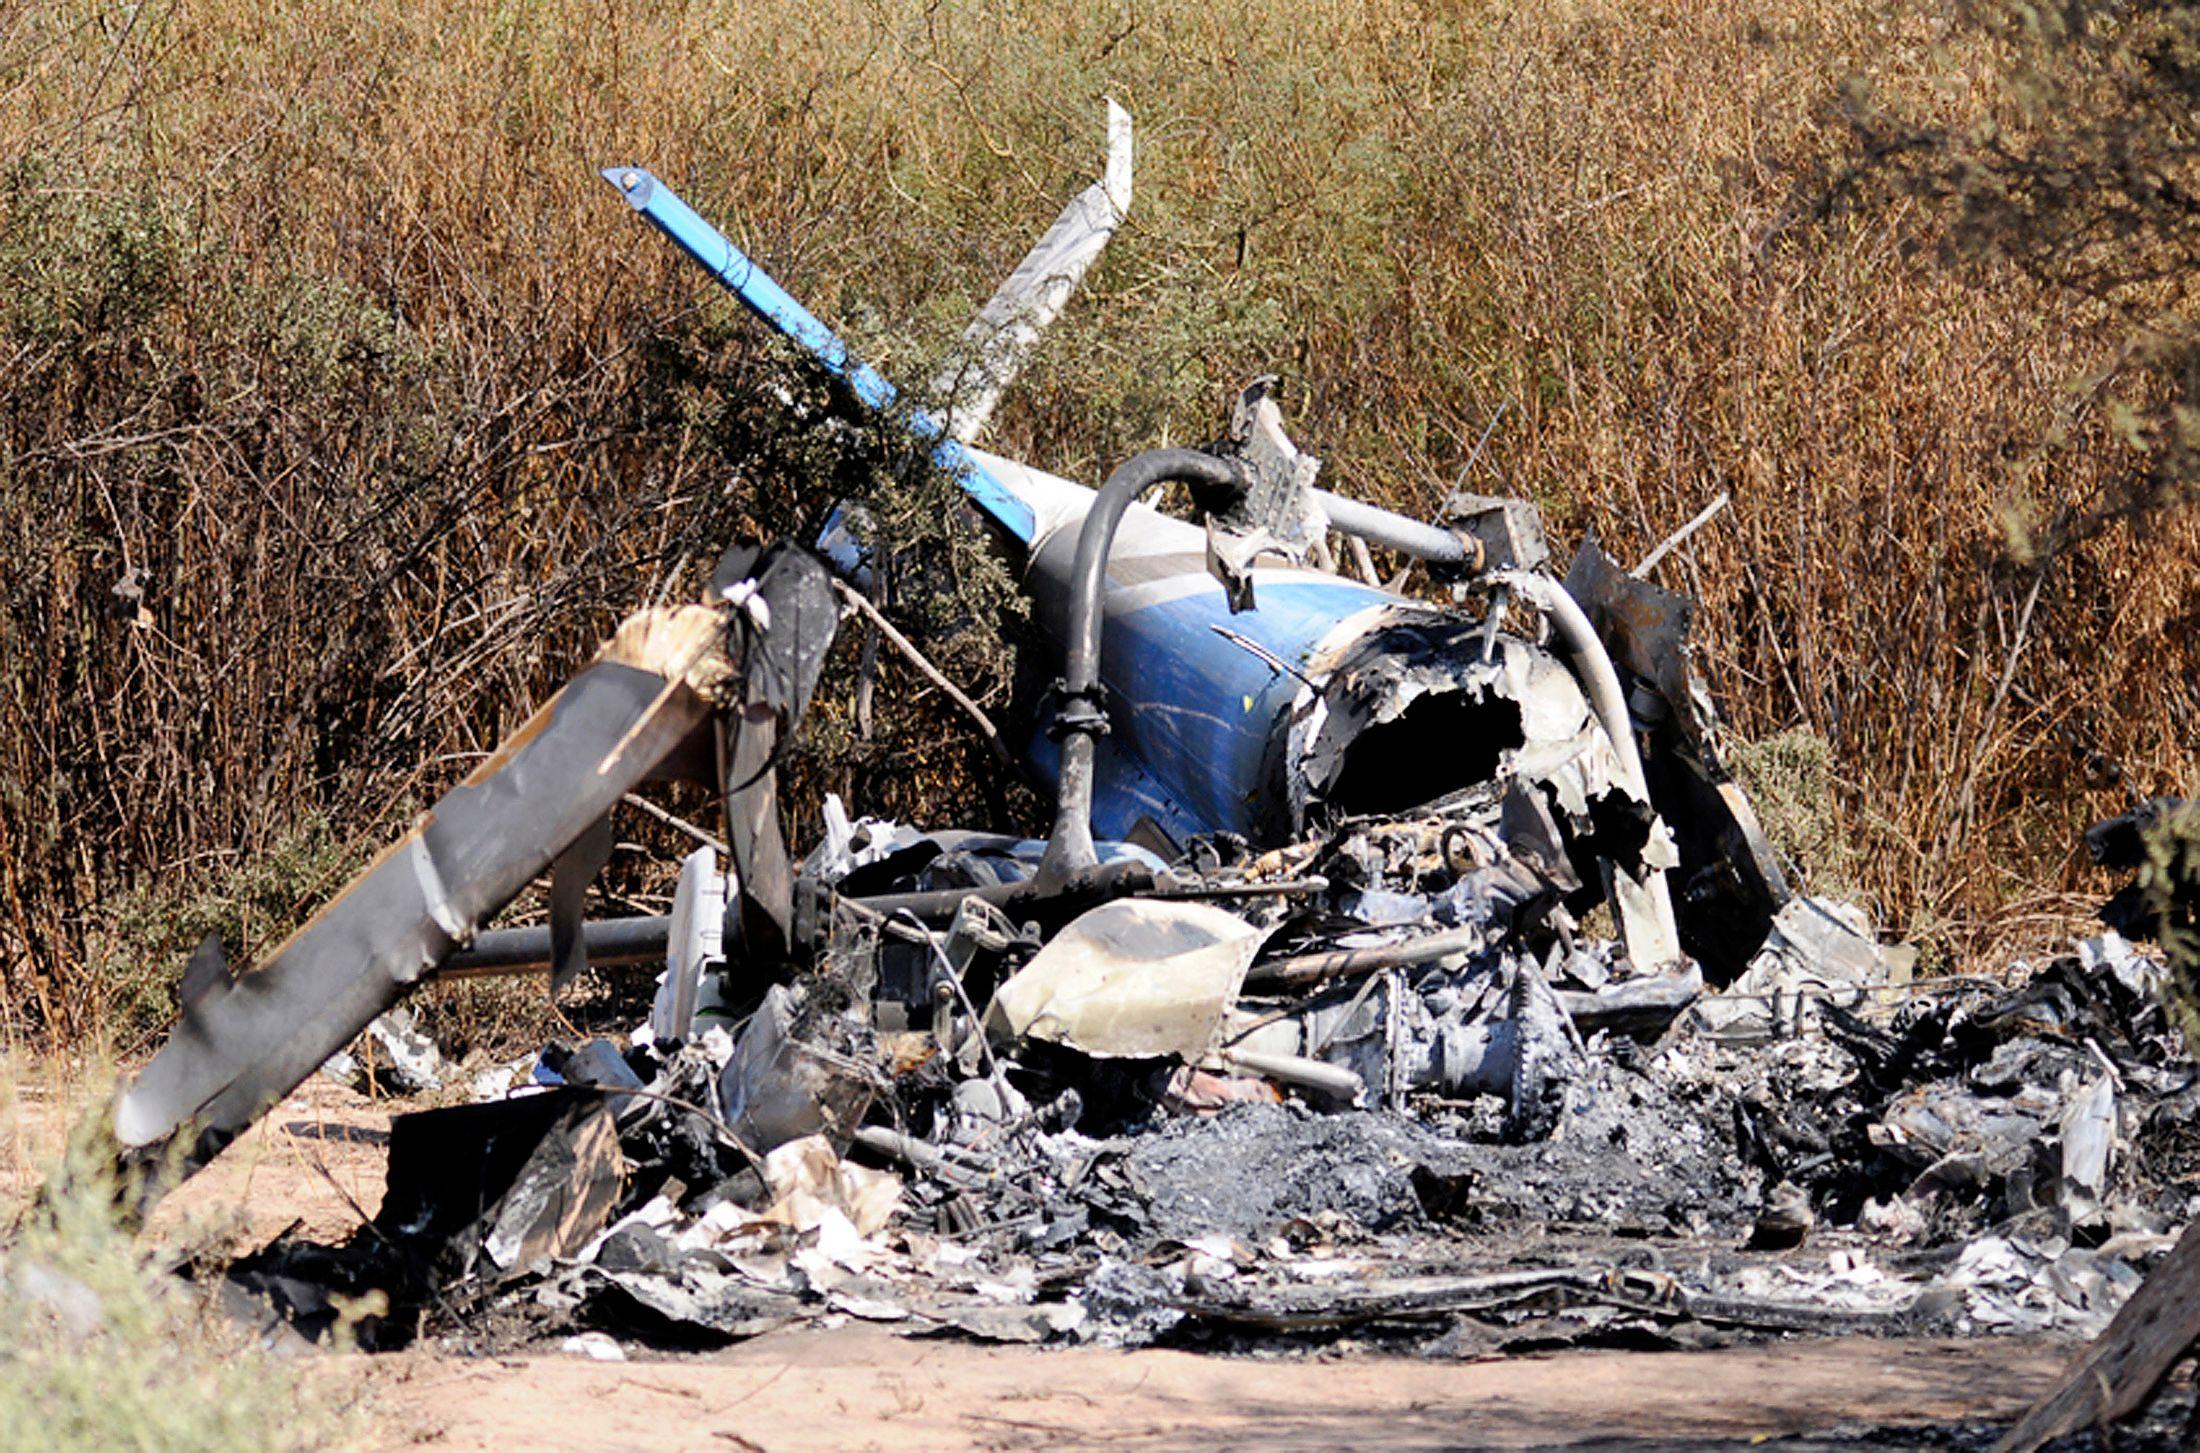 Le crash a fait 10 morts